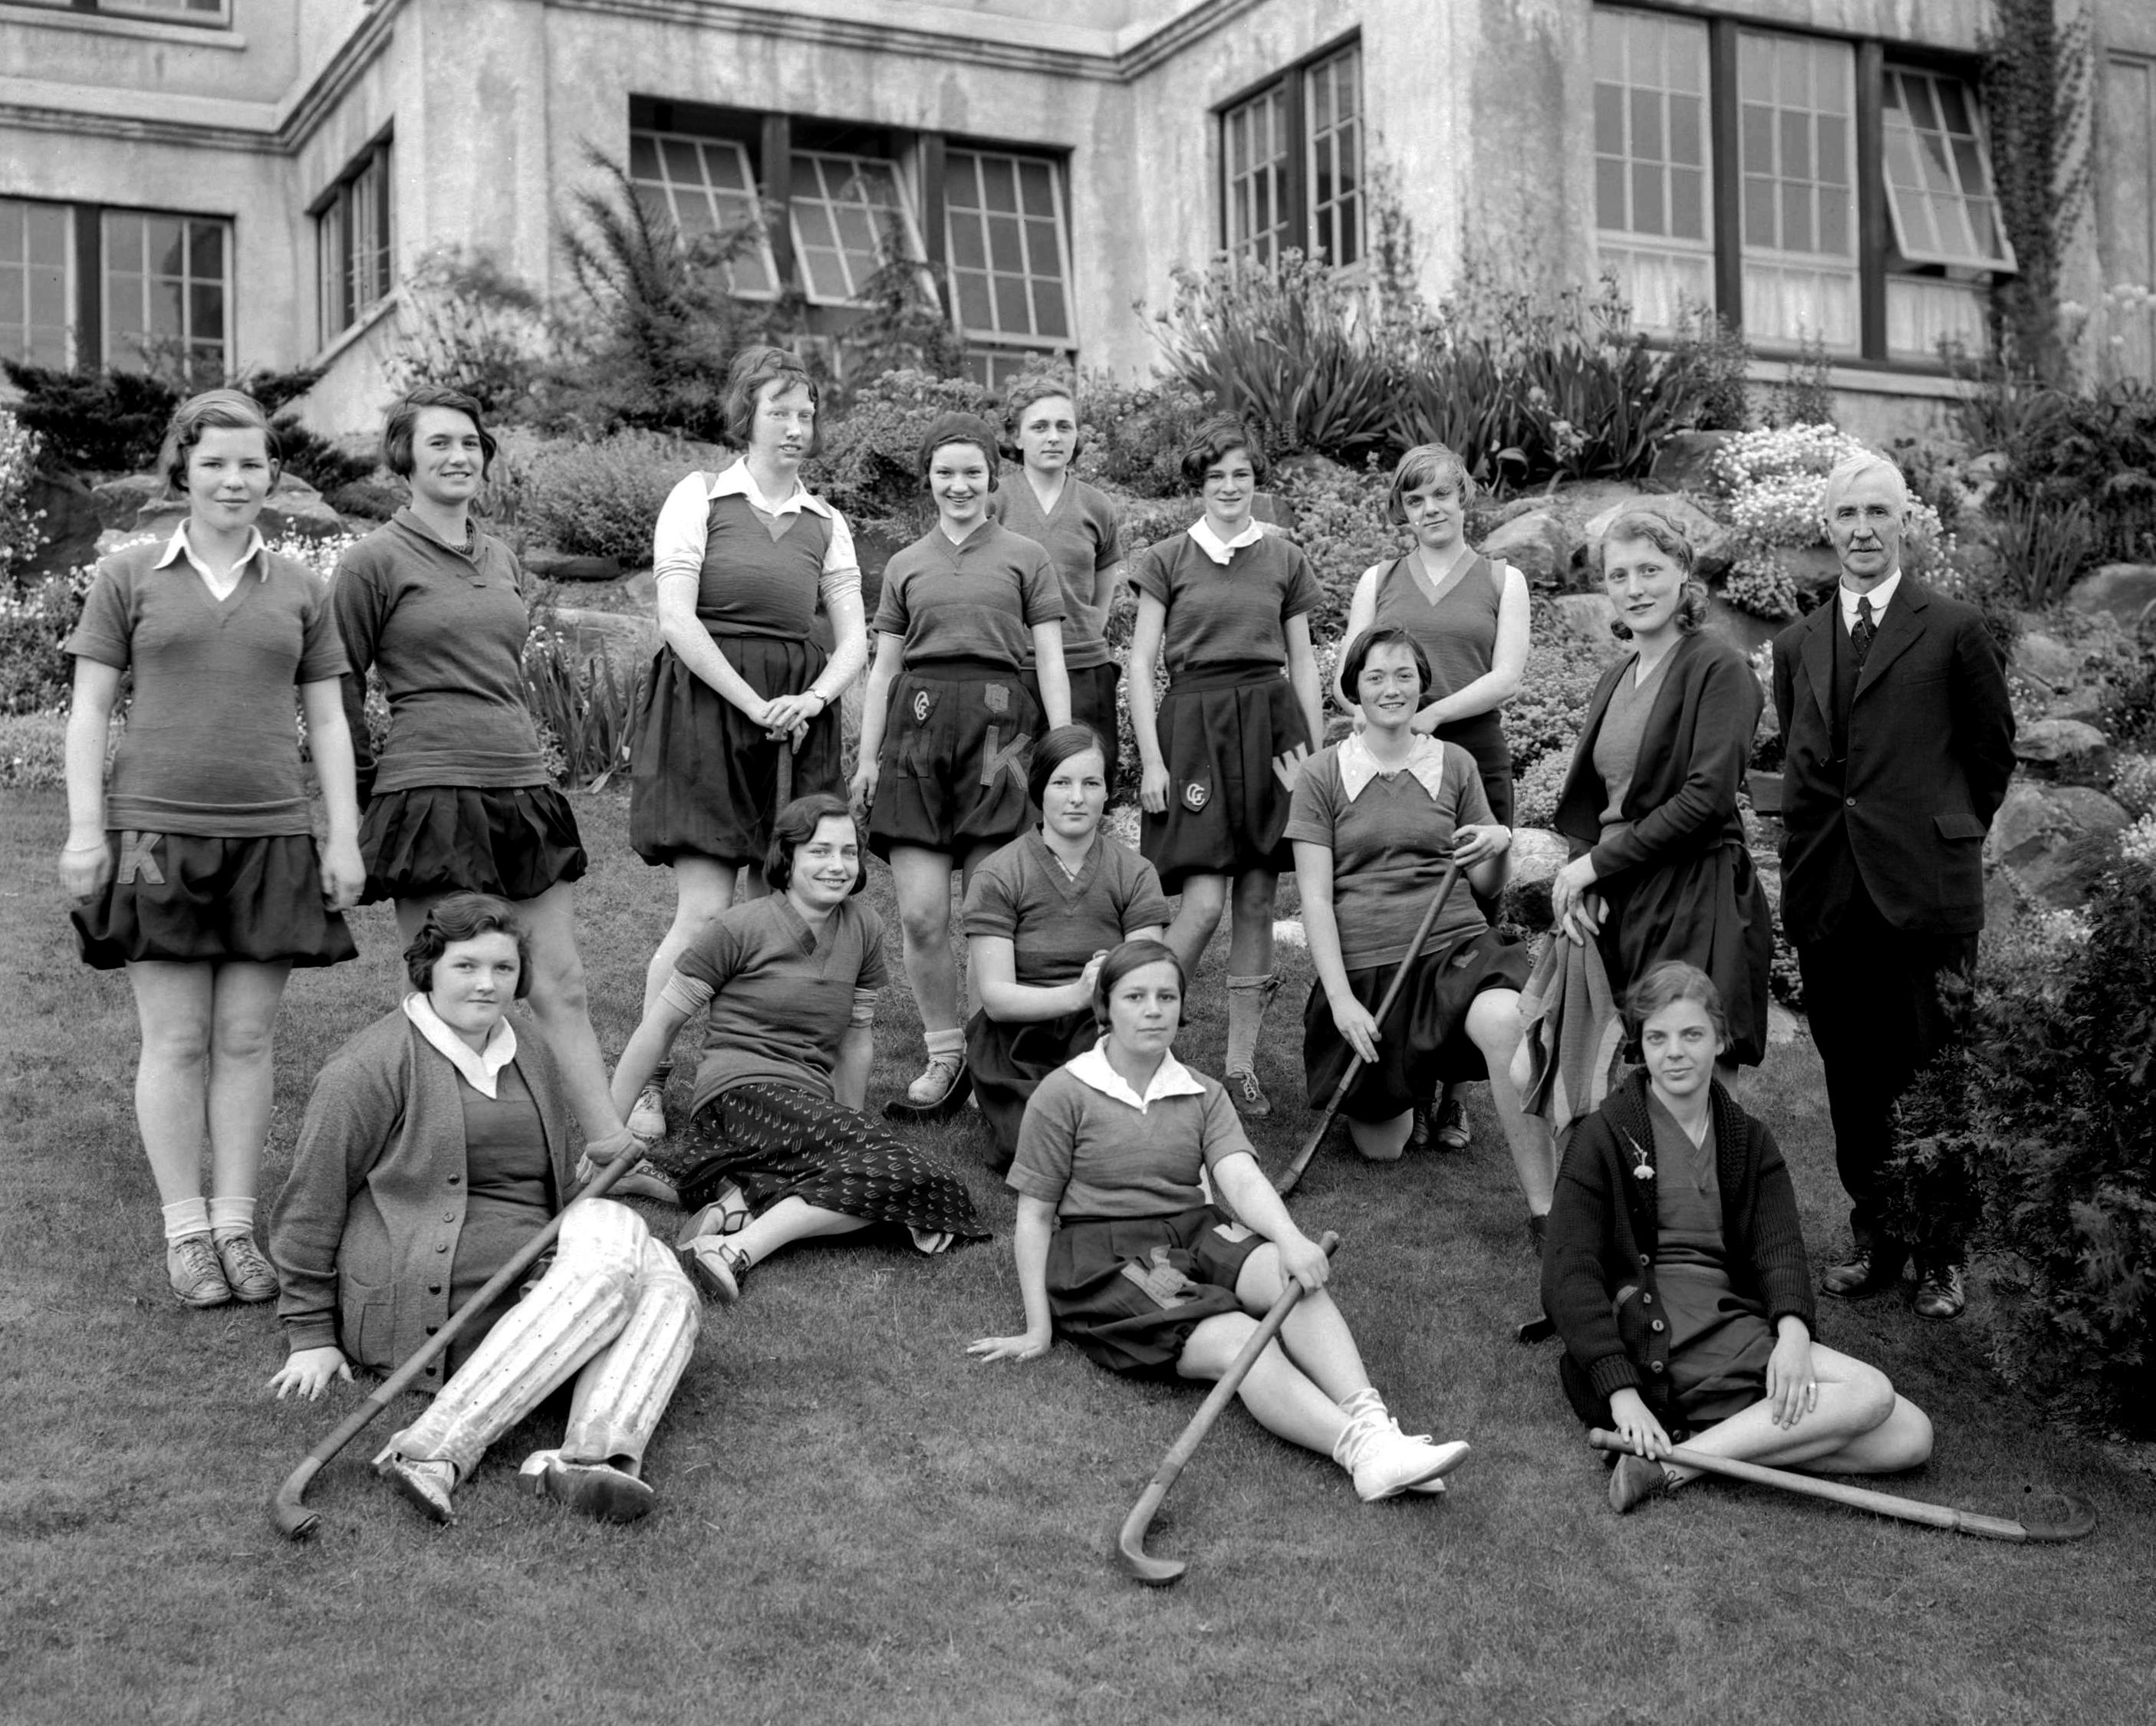 f4e2c2fa-c1ff-kitsjunior-girls-grasshockey1931